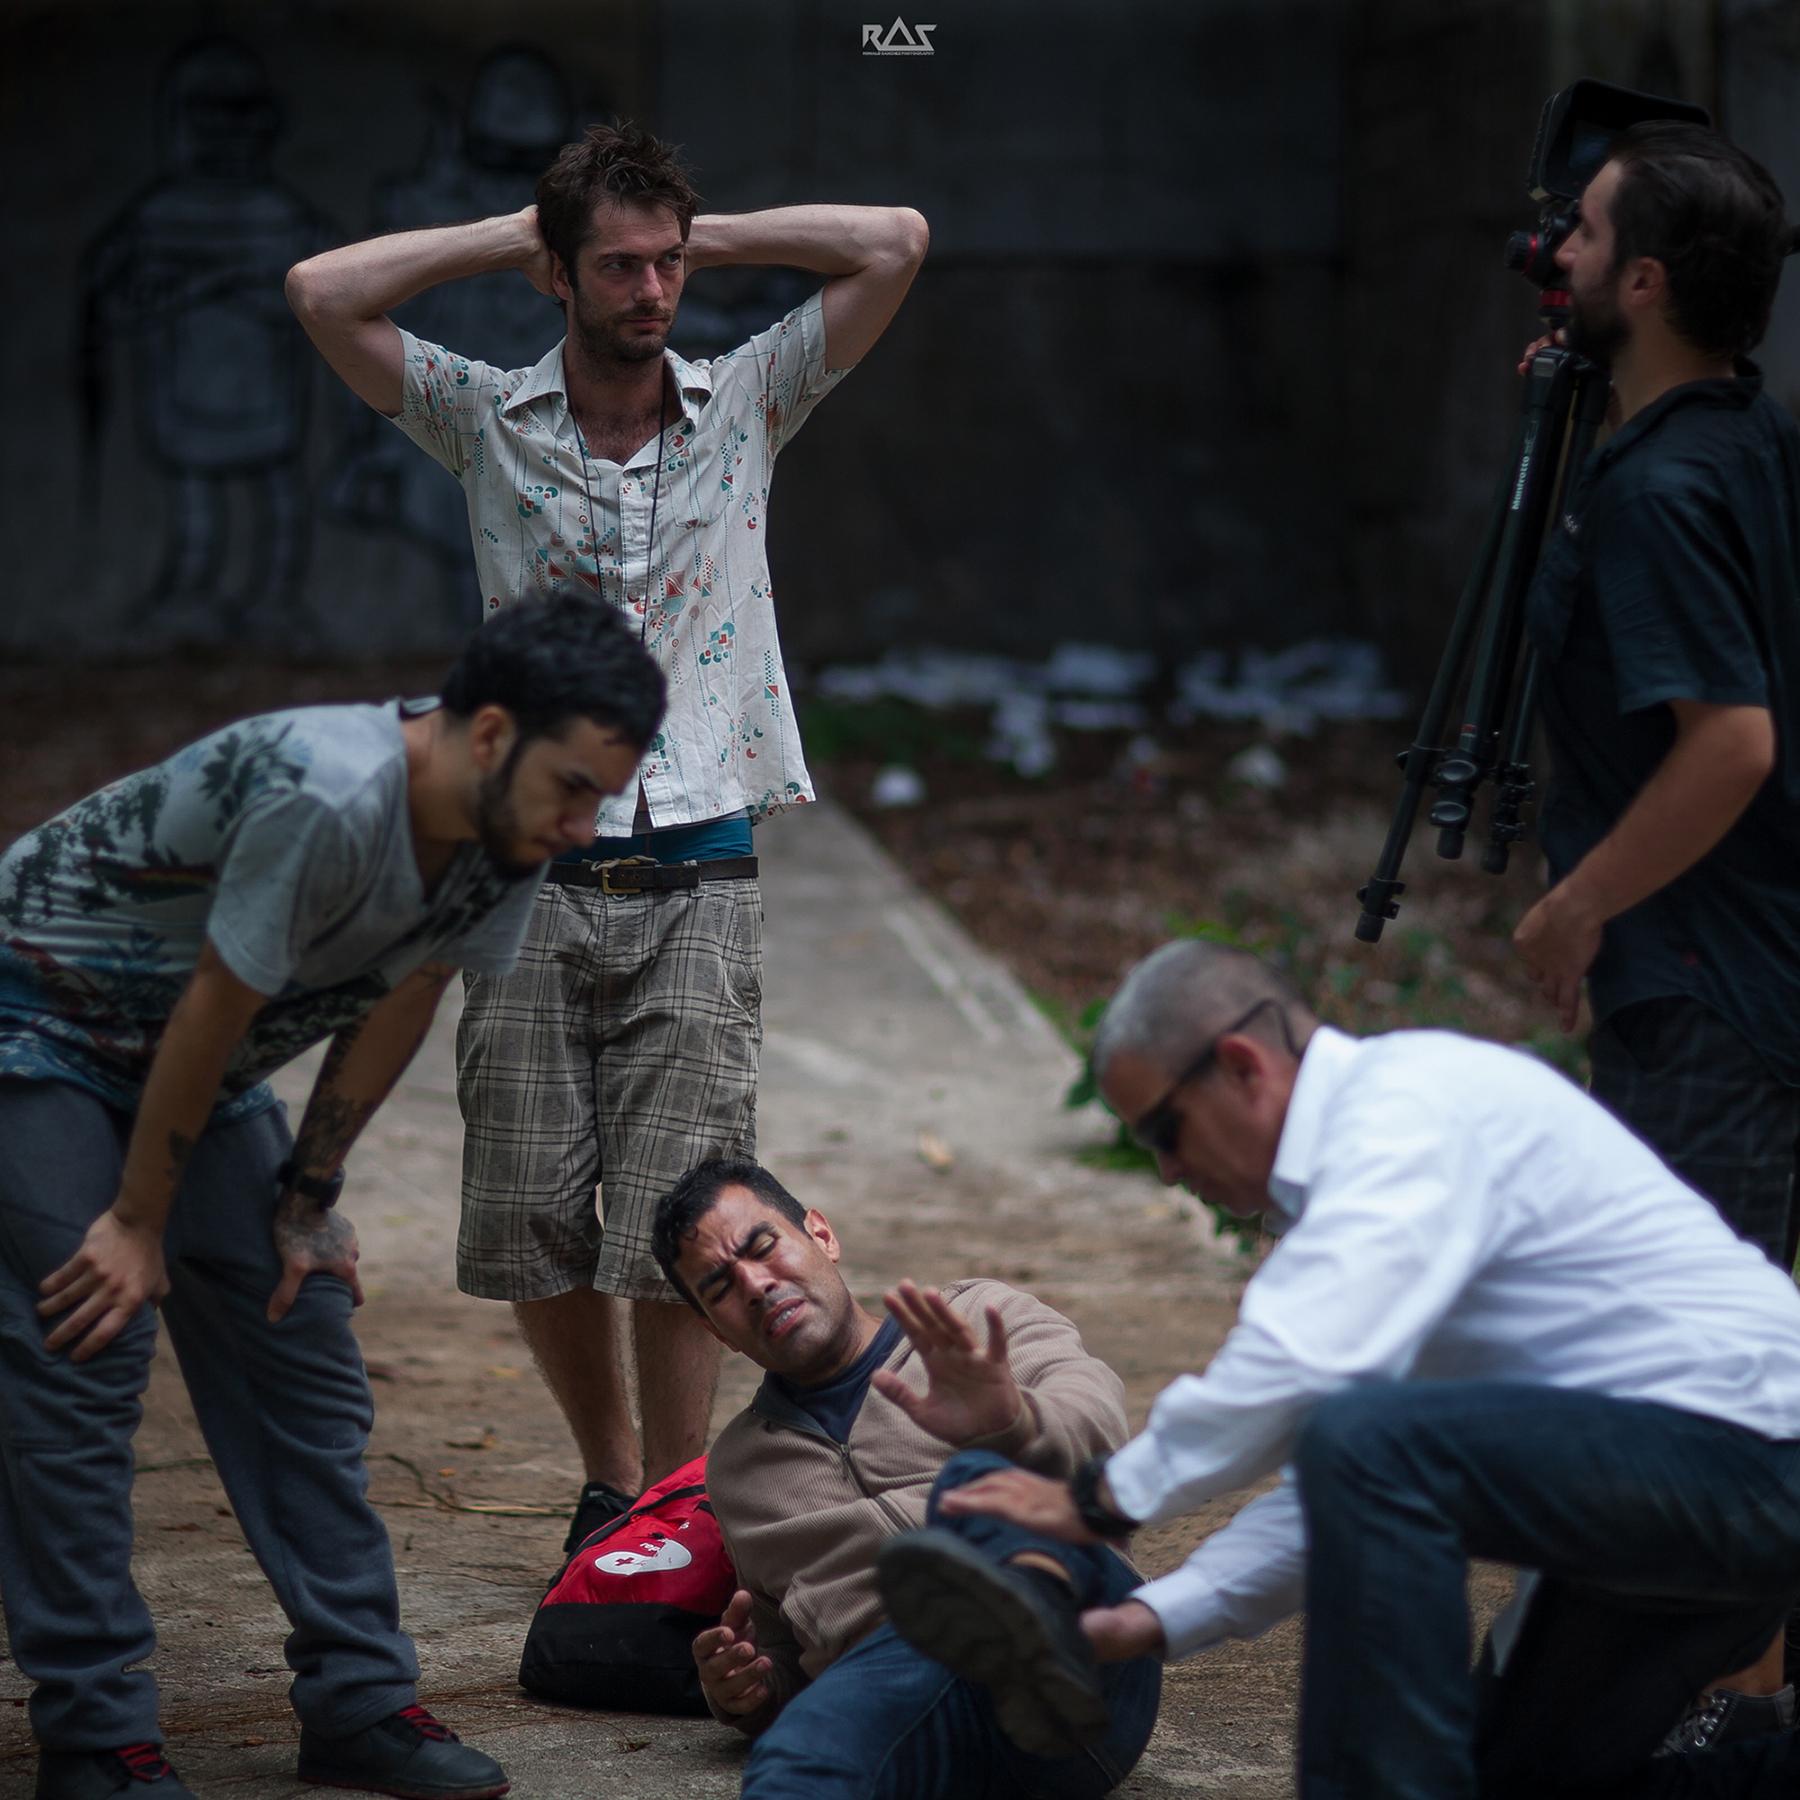 Mark Castro looks pensive as Jesus Reyes la Salle aids J.W. Cortés. Producer/director Michael Biggam shares a moment with producer/DoP David Mondin.